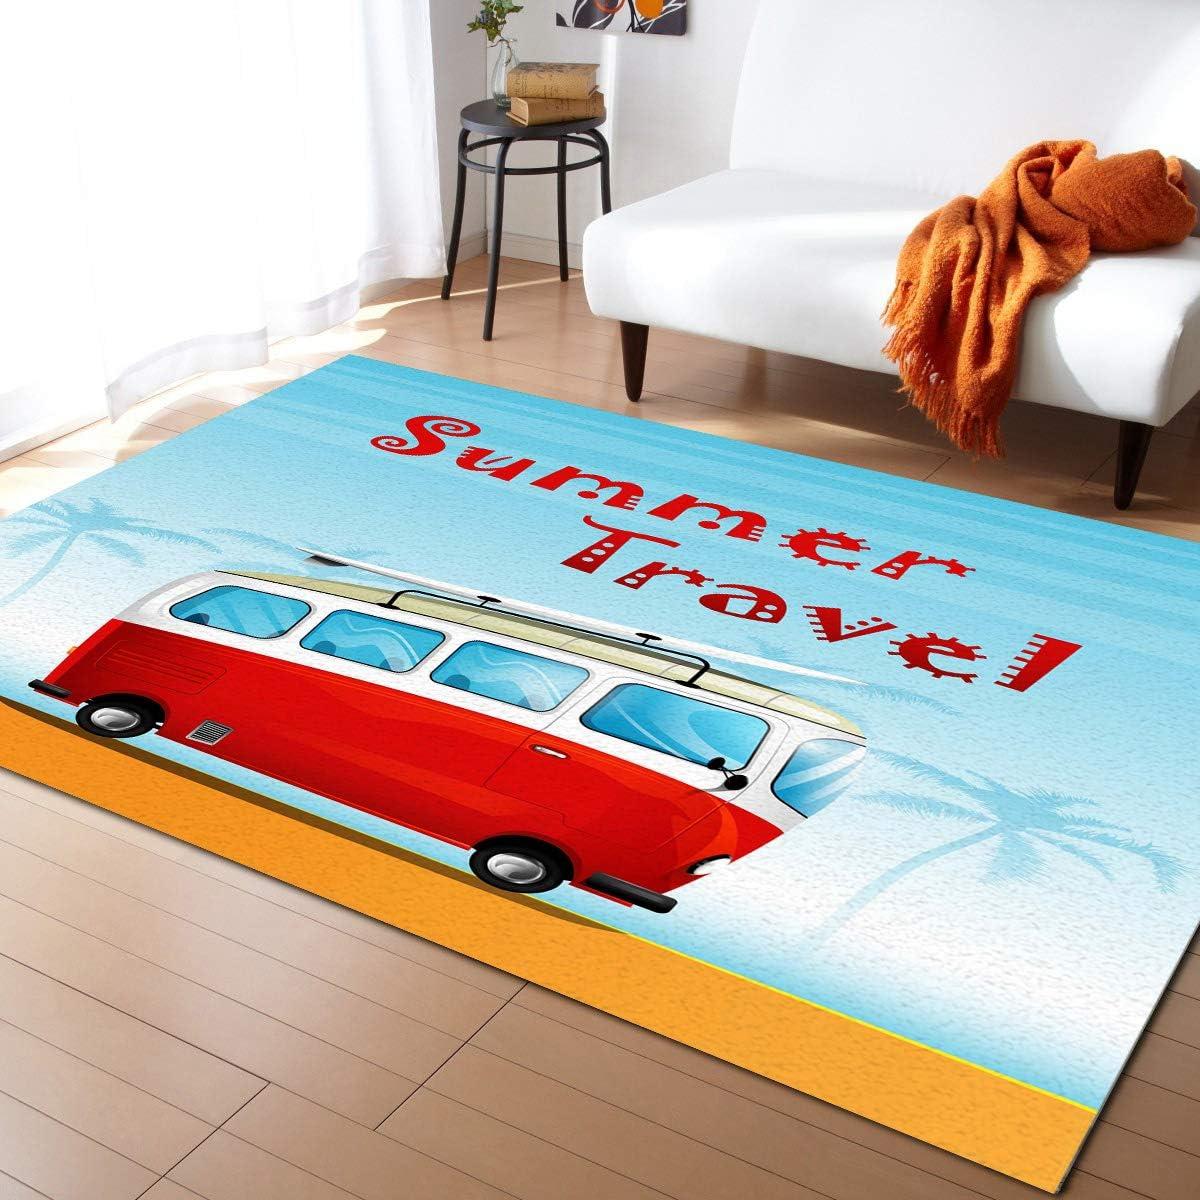 Advancey 輸入 Indoor High-Low まとめ買い特価 Area Rug Travel Summer 2'x3' Bus Beach